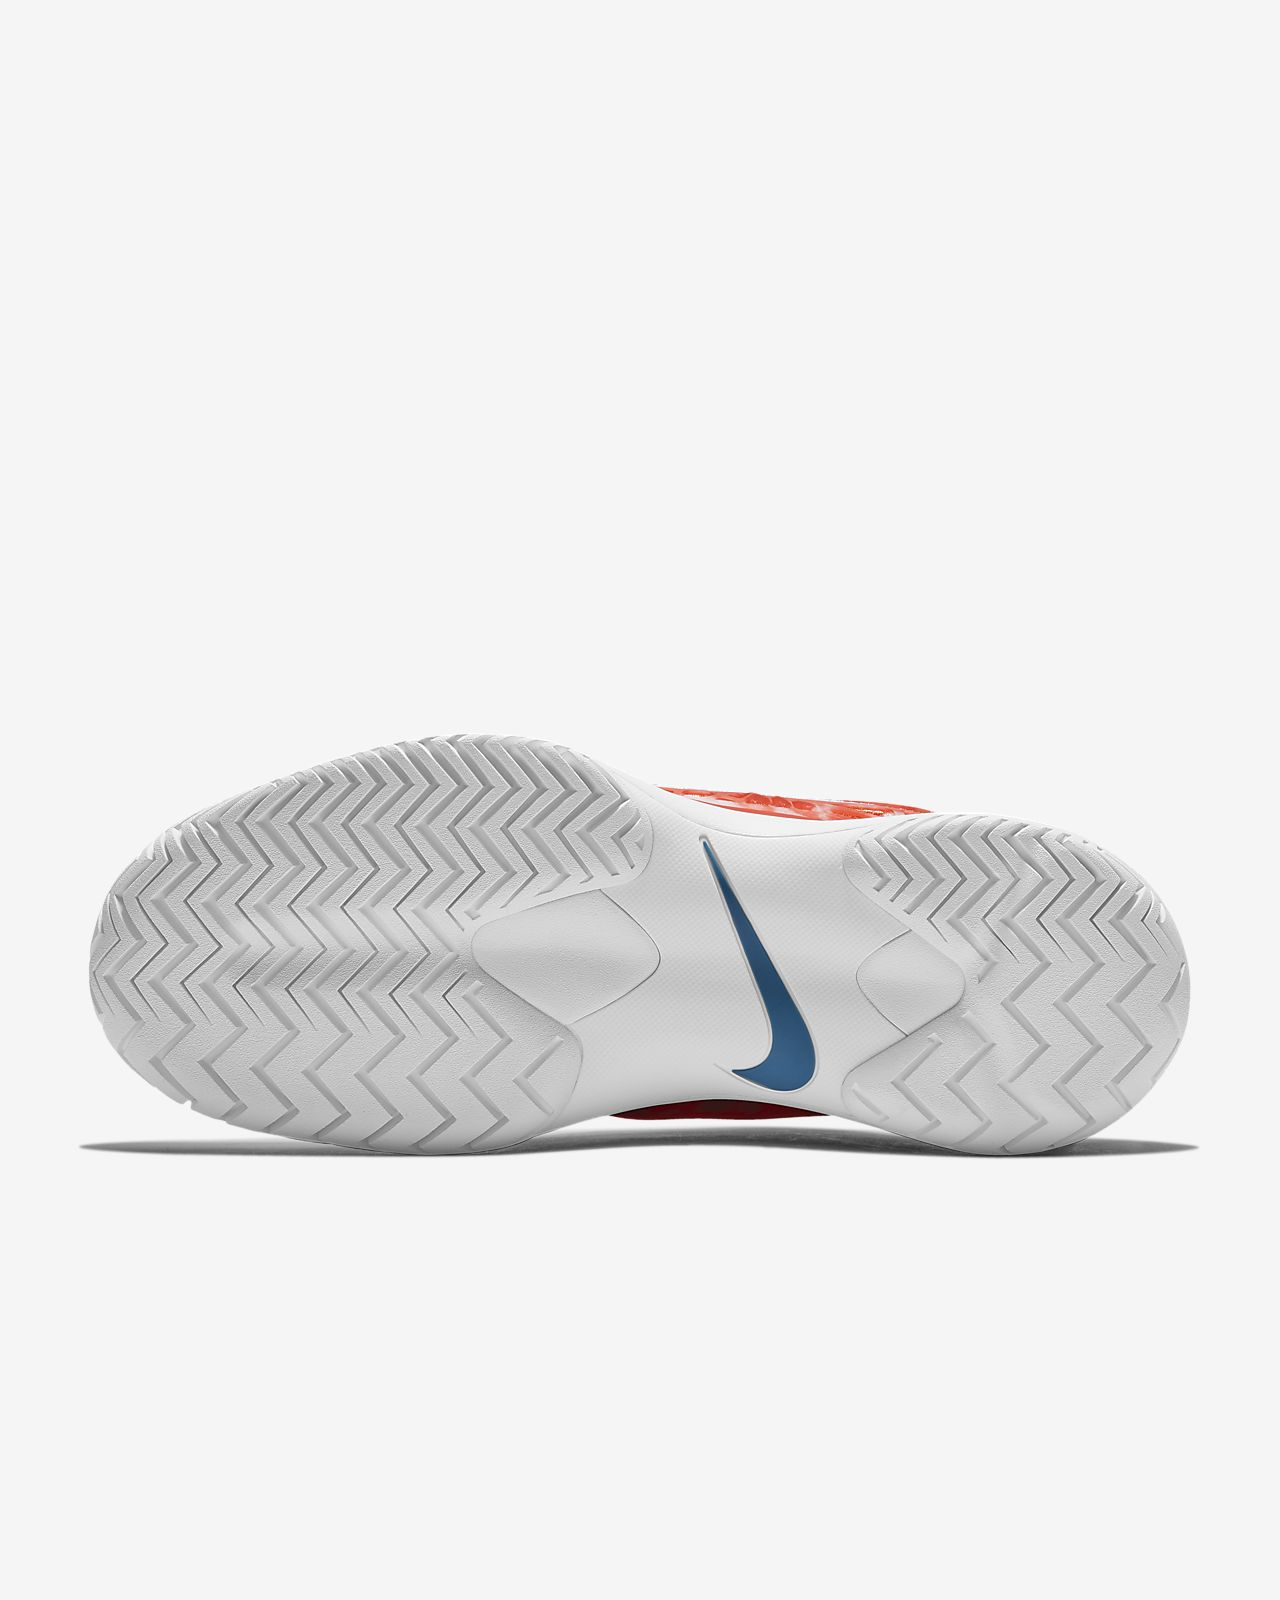 0bff8322899c2 NikeCourt Air Zoom Cage 3 Premium Women s Tennis Shoe. Nike.com ZA